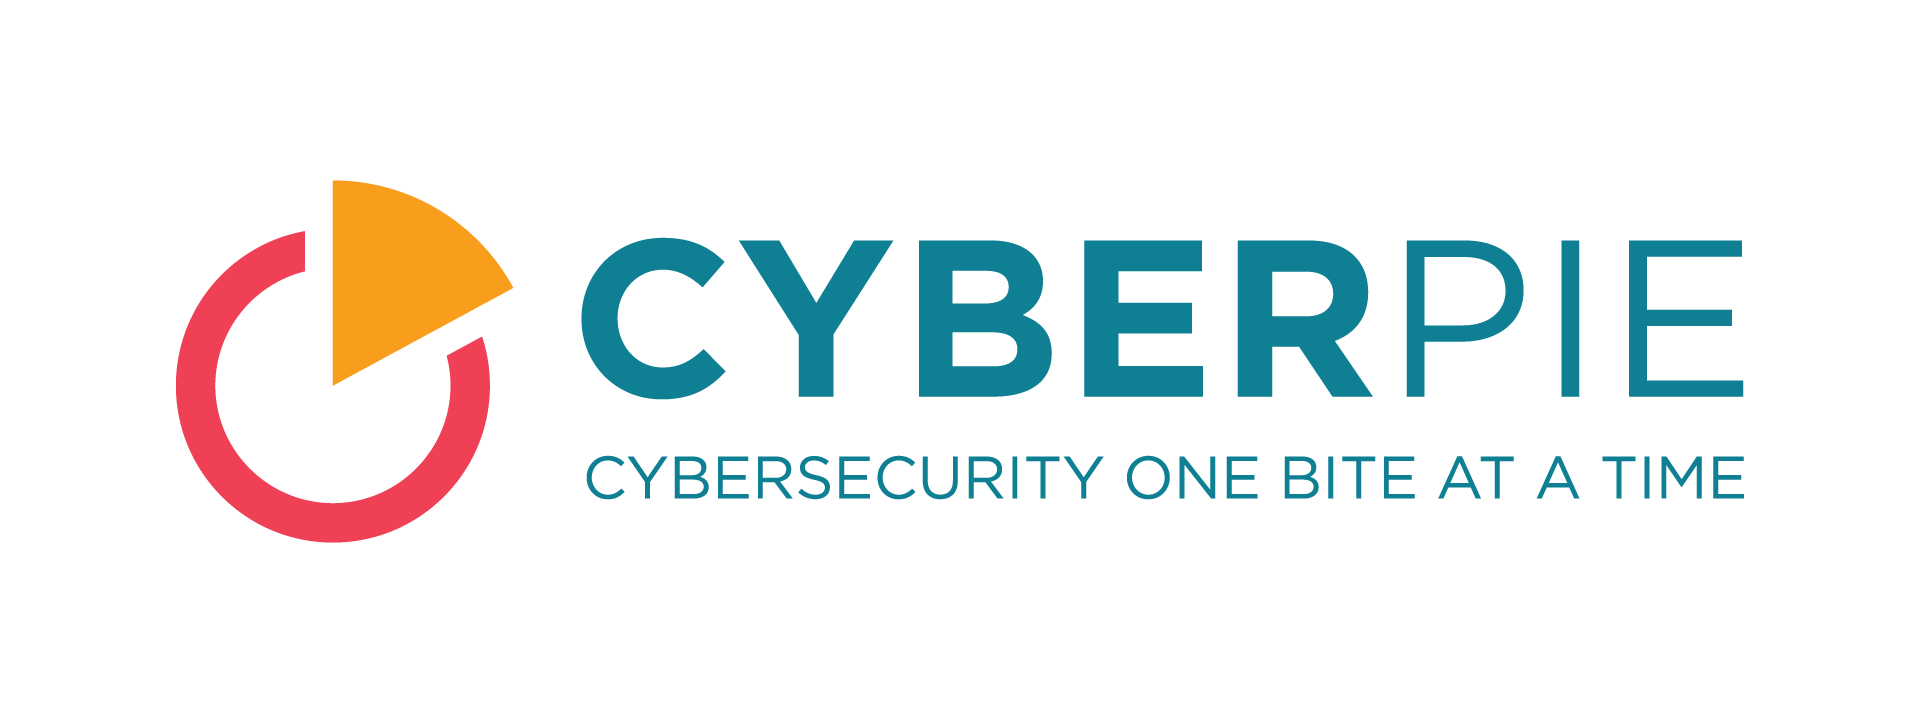 CyberPie logo no background